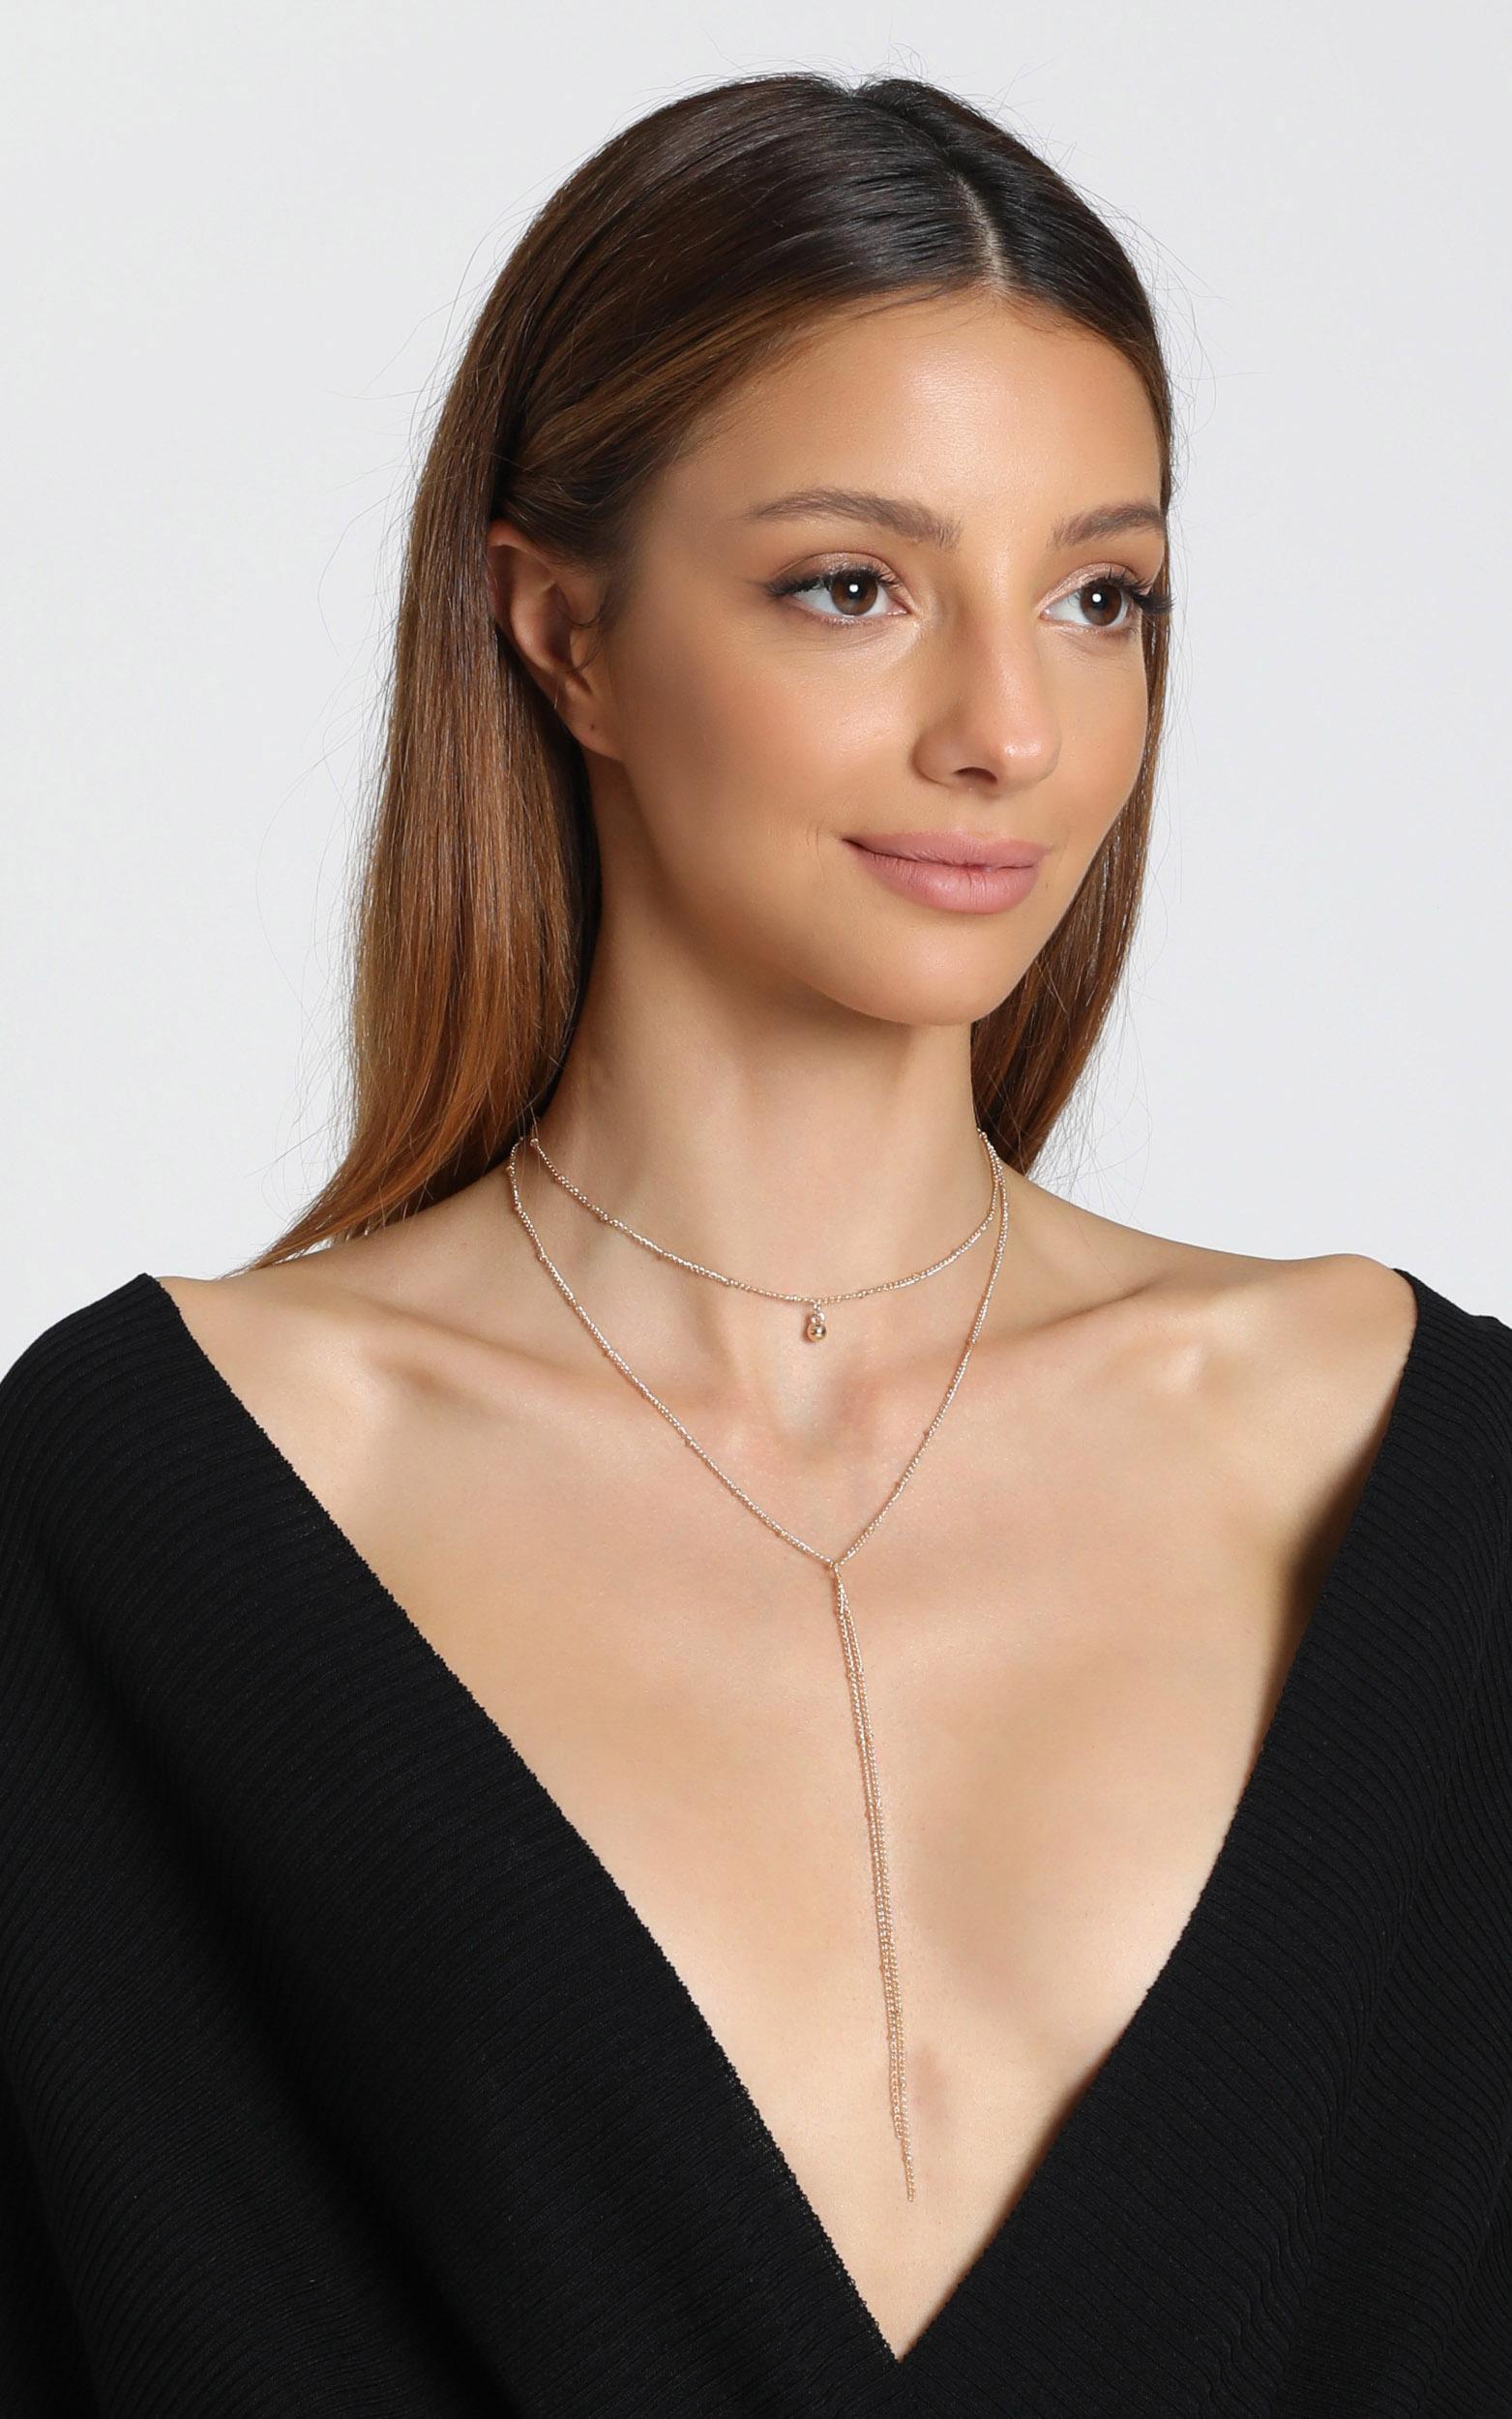 Estella Drop Necklace in Gold, , hi-res image number null